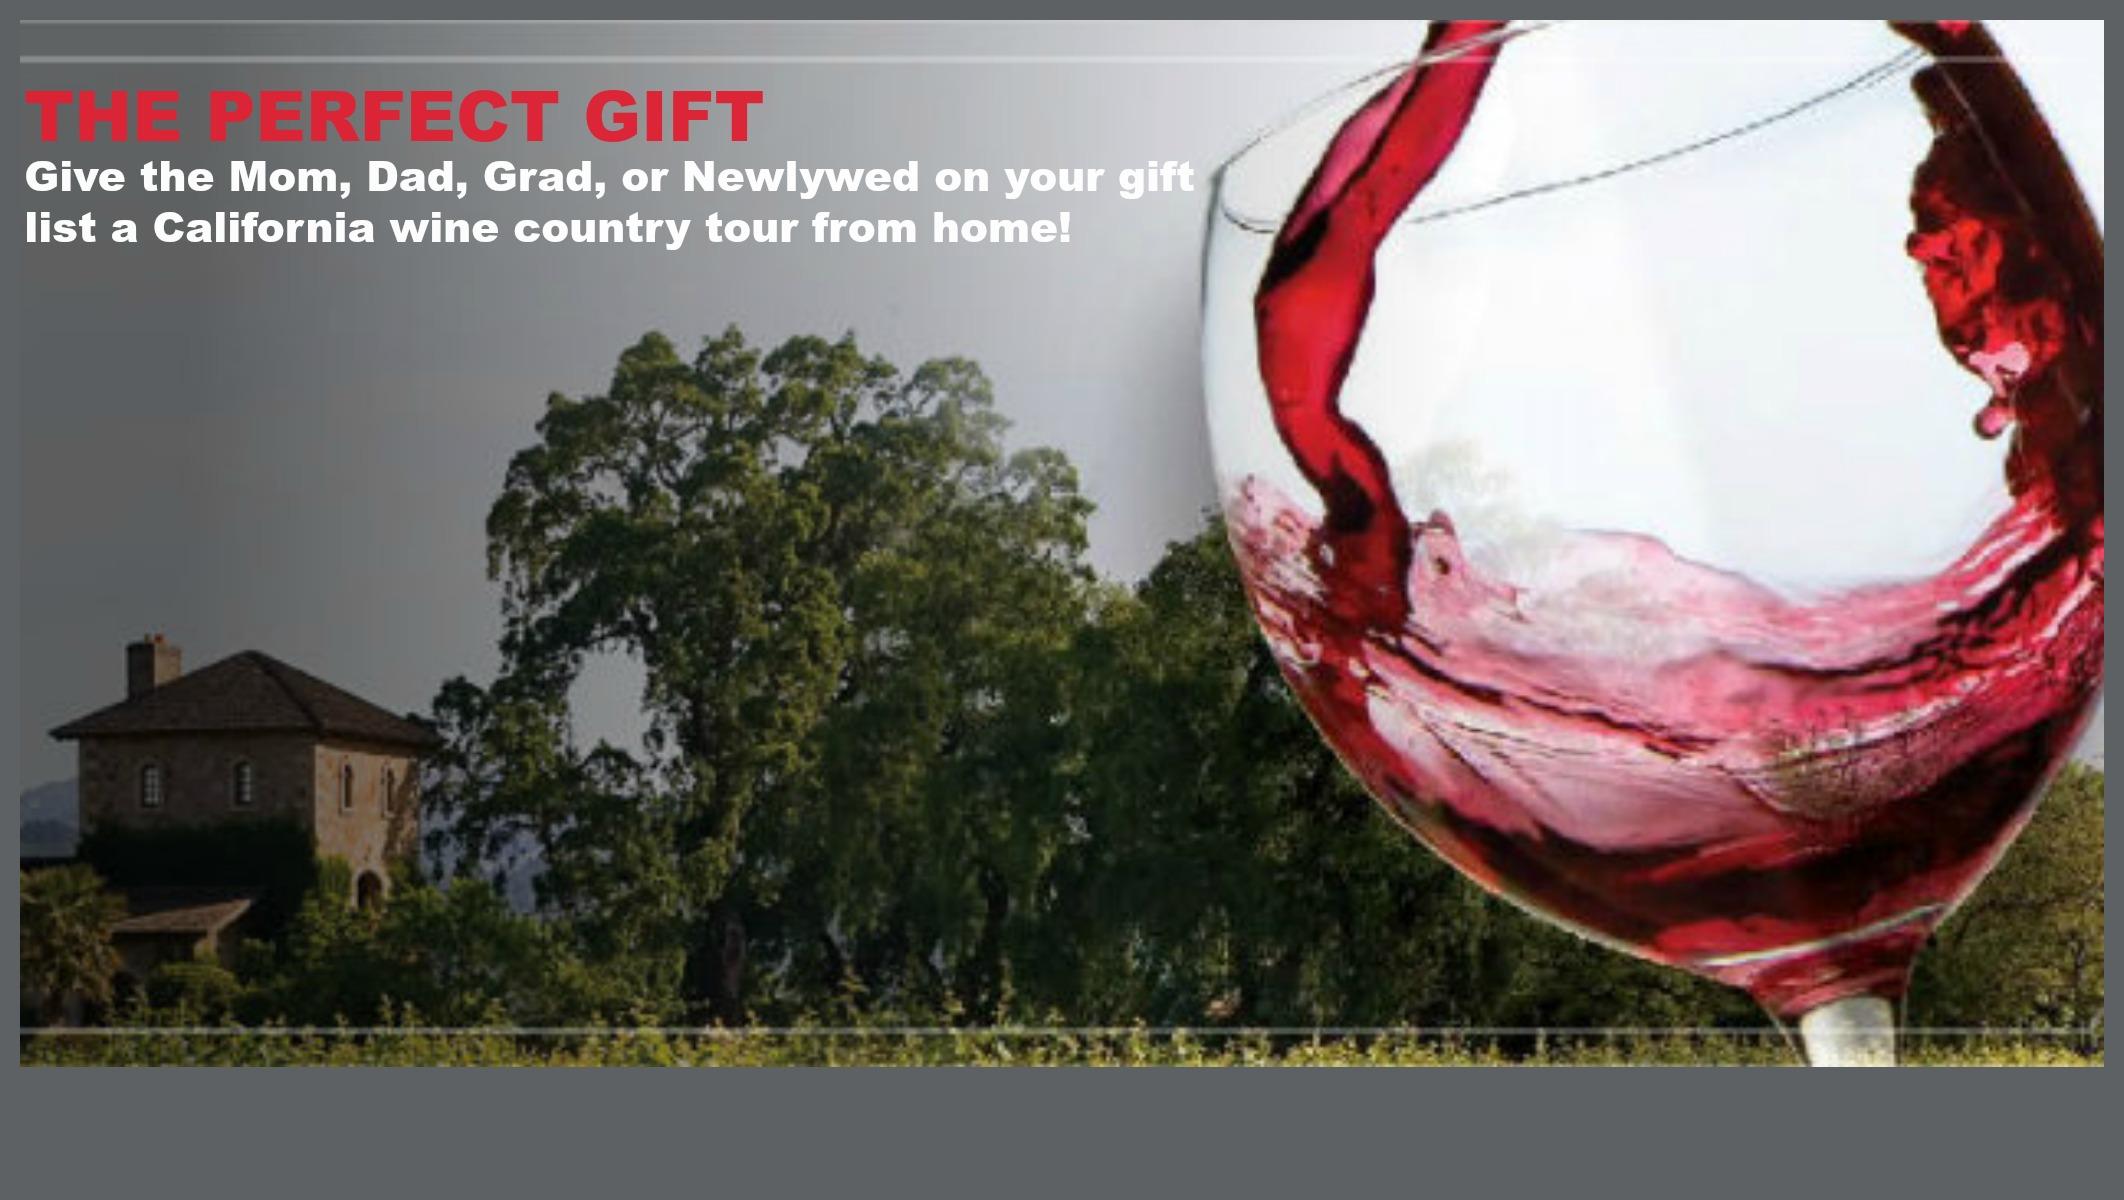 The perfect gift - wine club membership, best wines